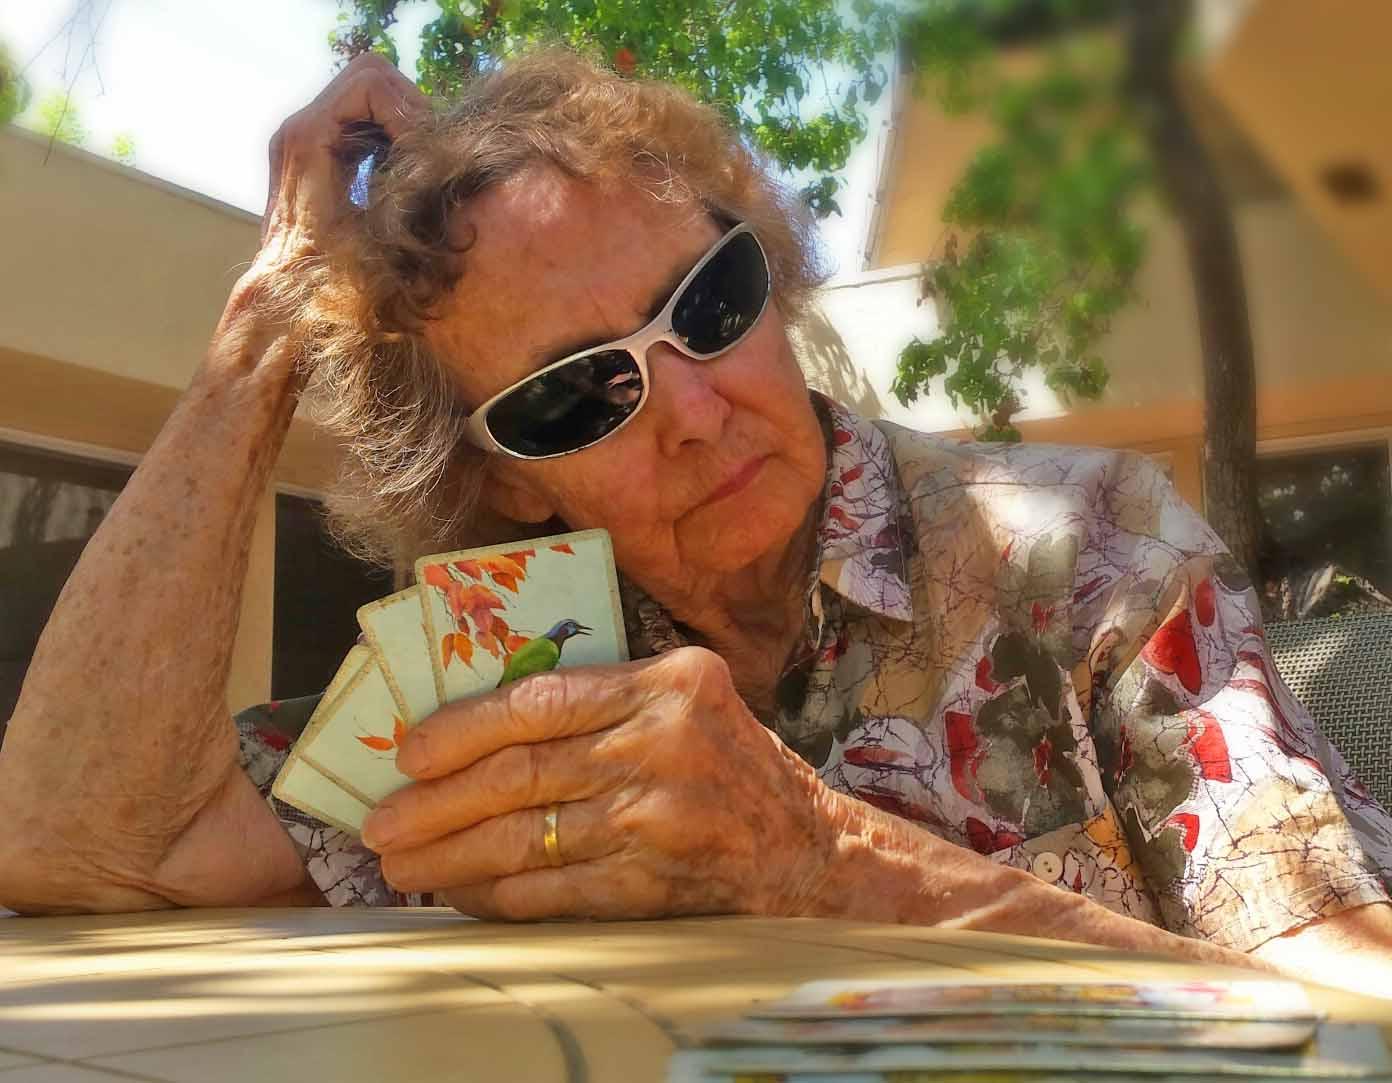 Photo: (c) Barb Ayers, DogDiary.org